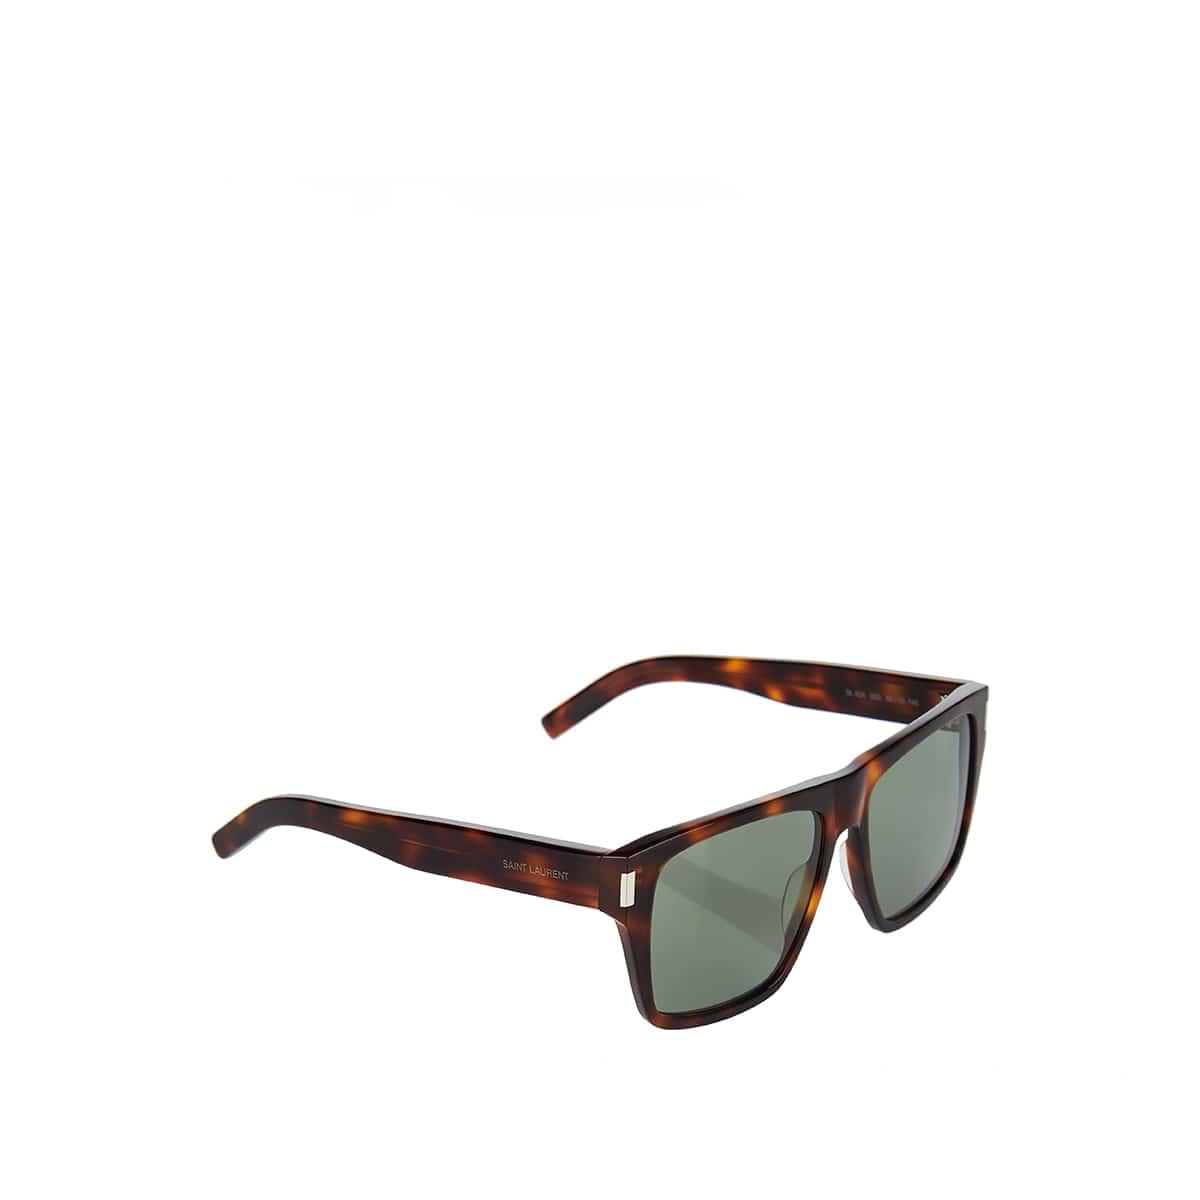 SL 424 square sunglasses